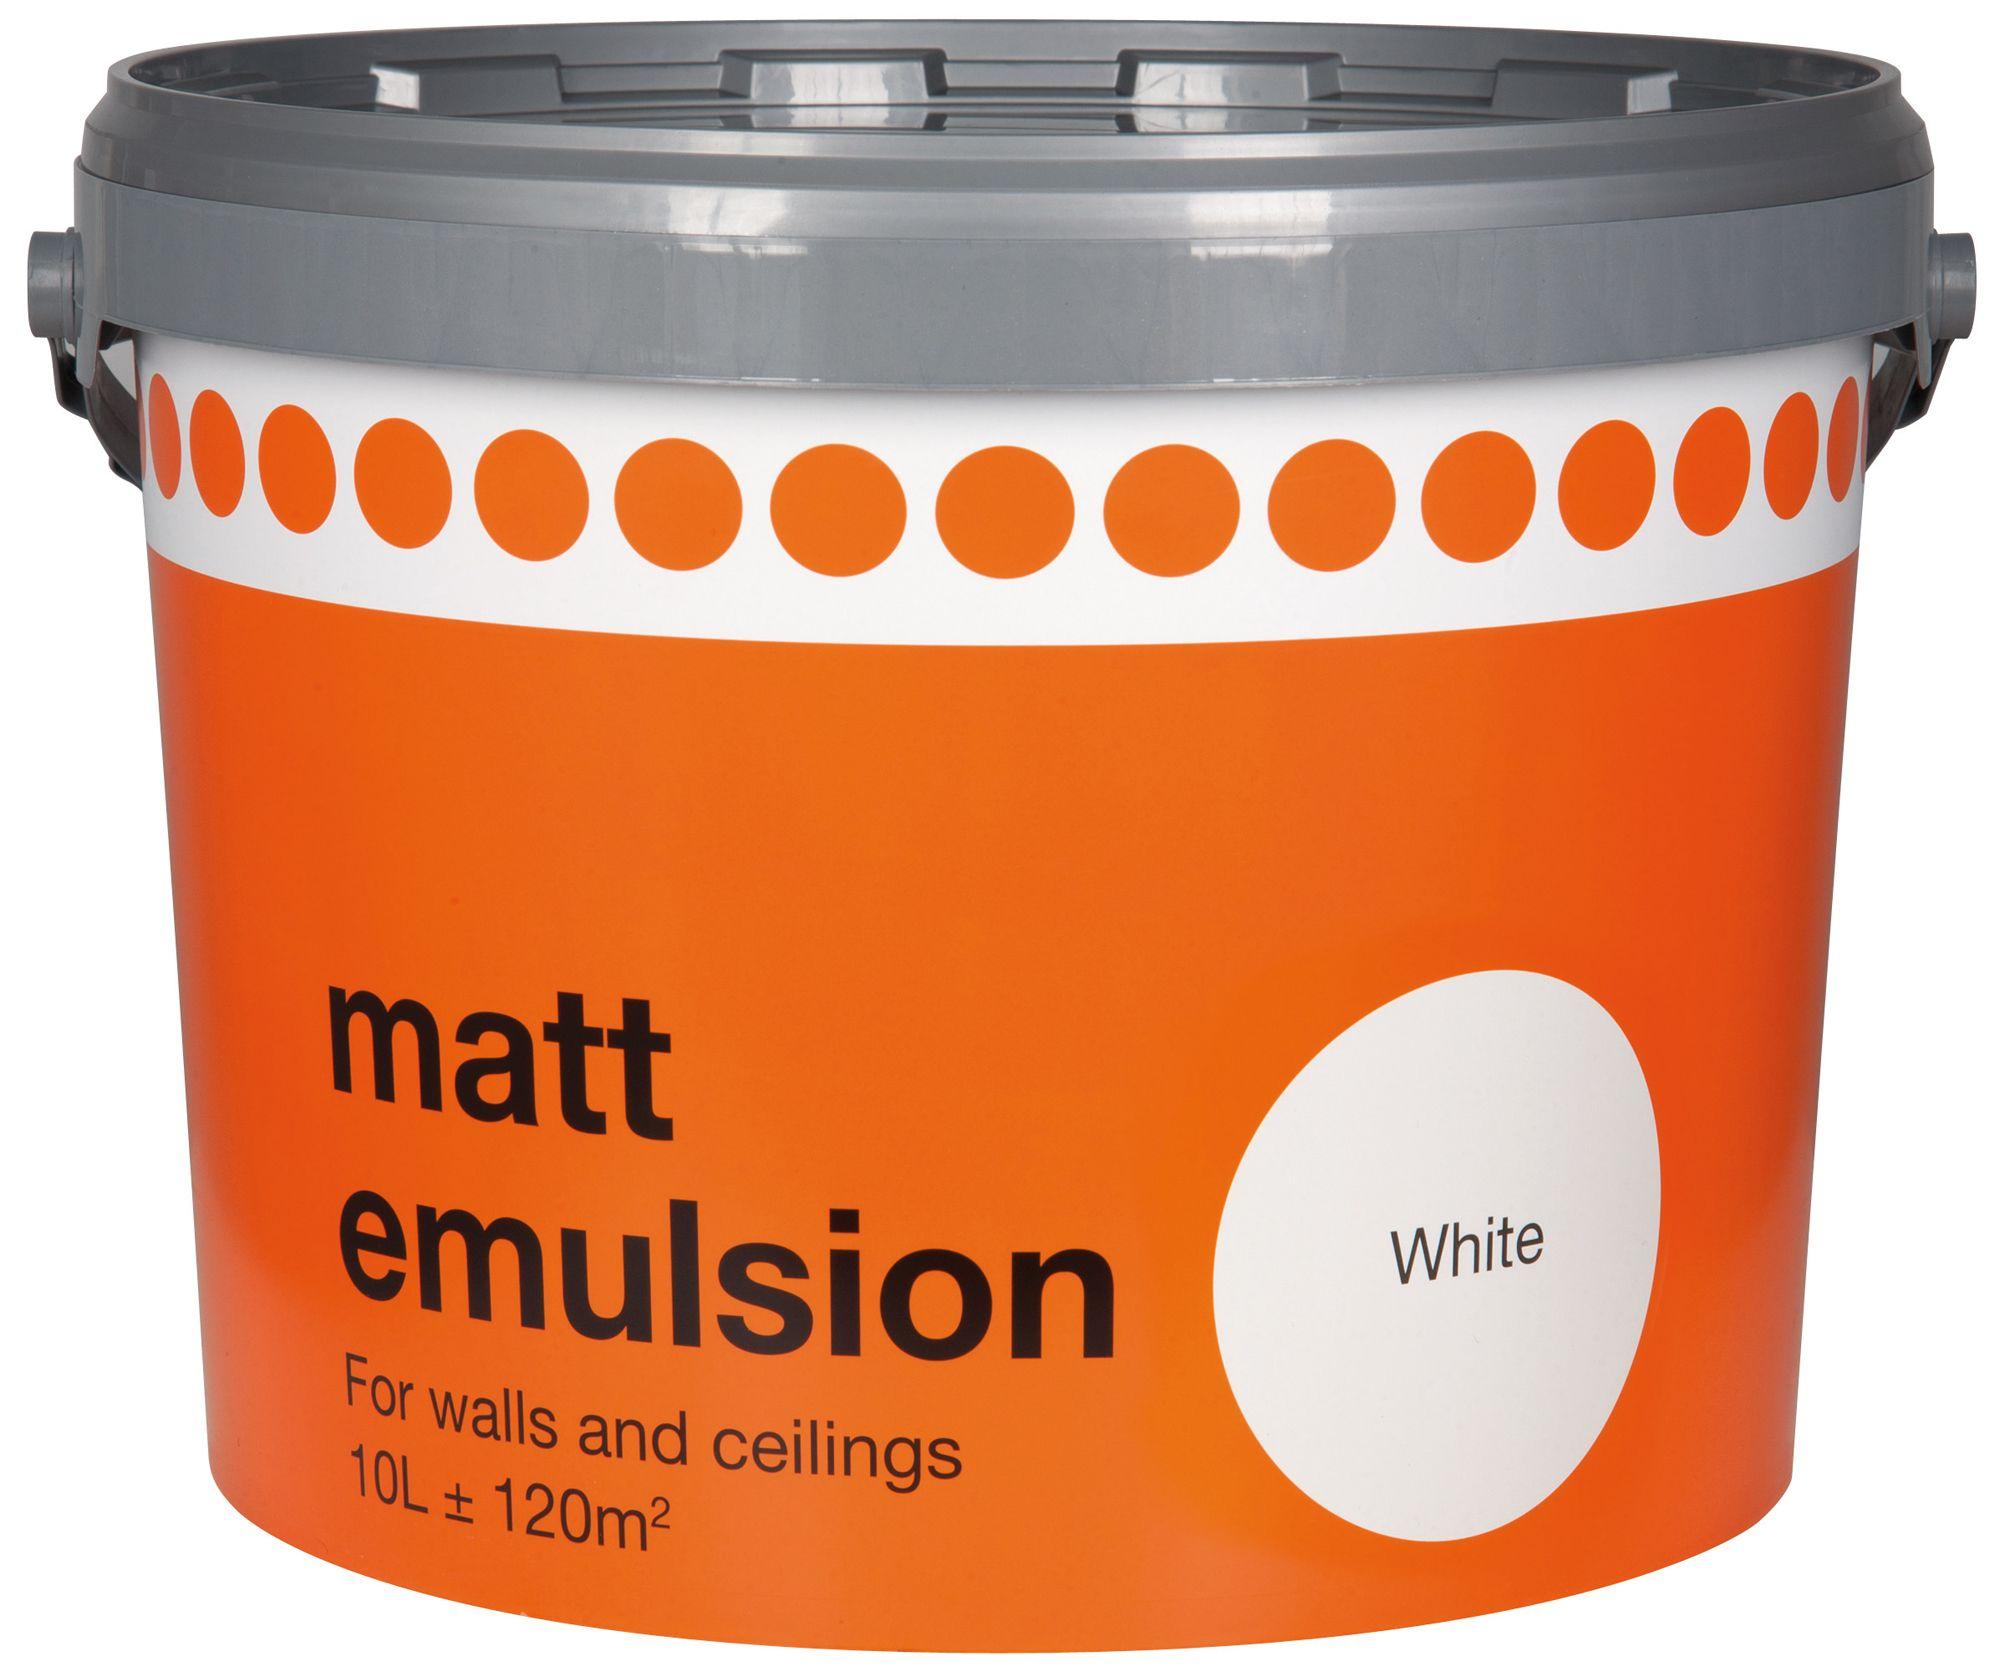 B&Q White Matt Emulsion Paint 10L | Departments | DIY at B&Q